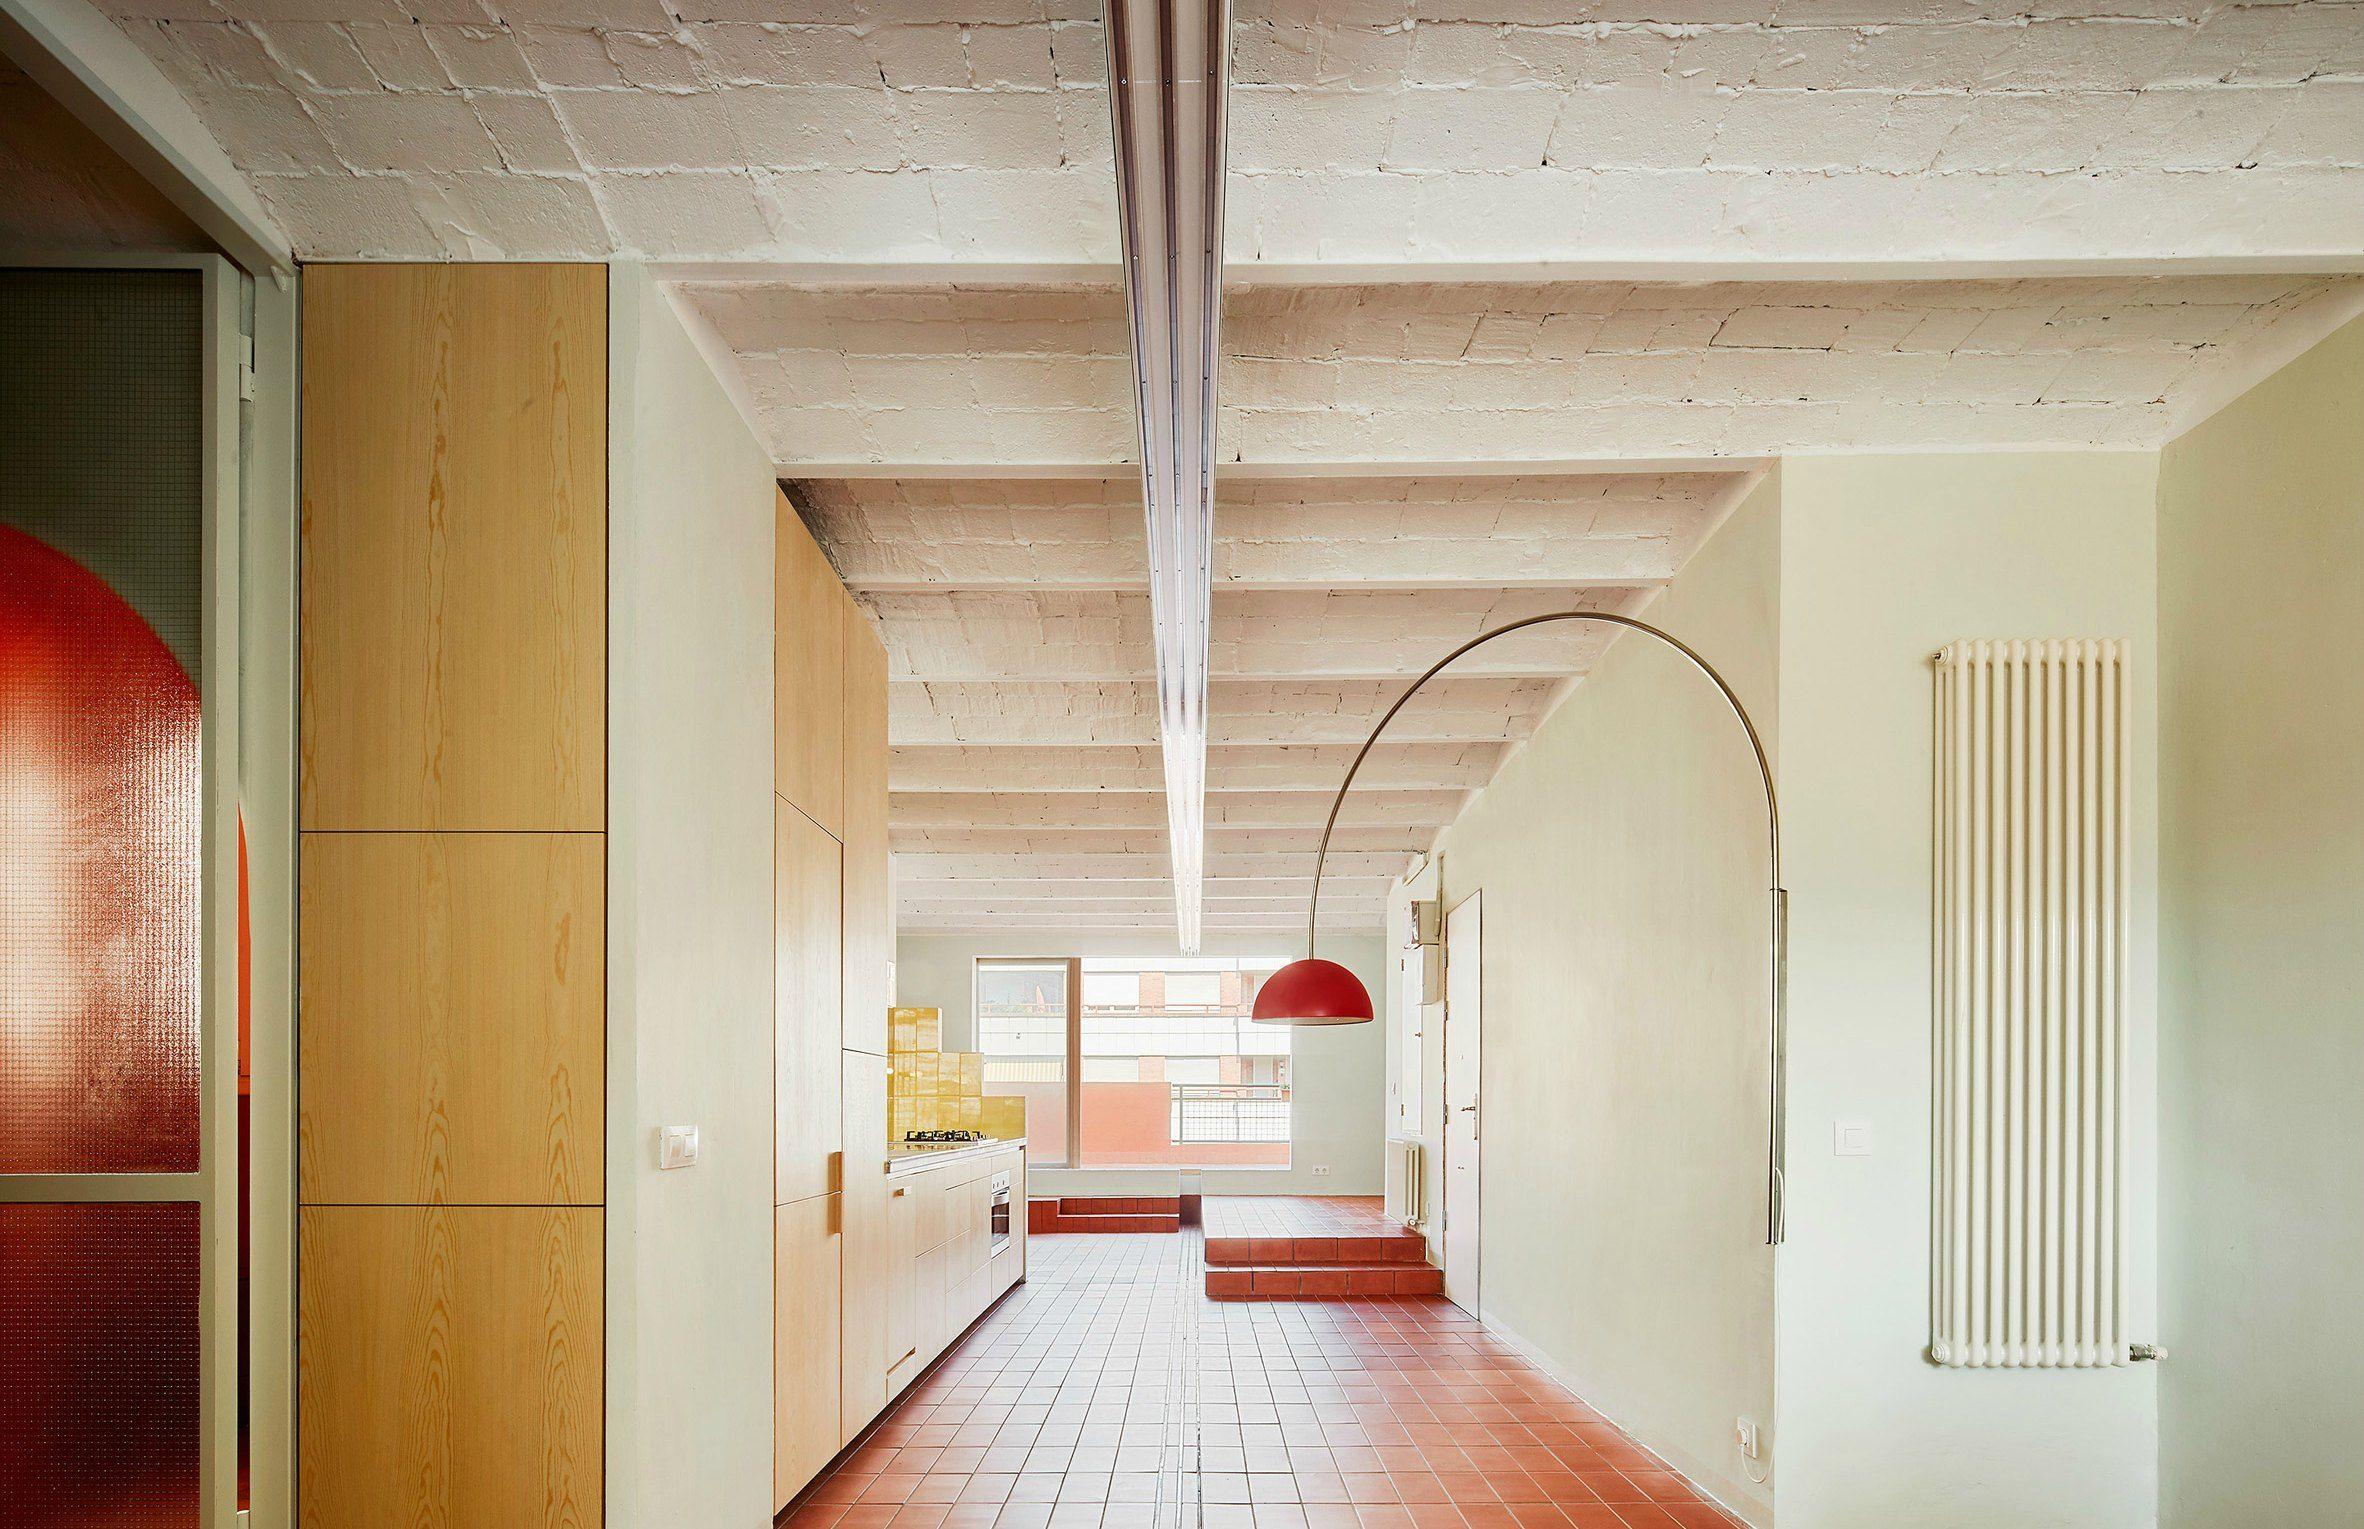 Piastrelle colorate per ht apartment by landmak architecture arc